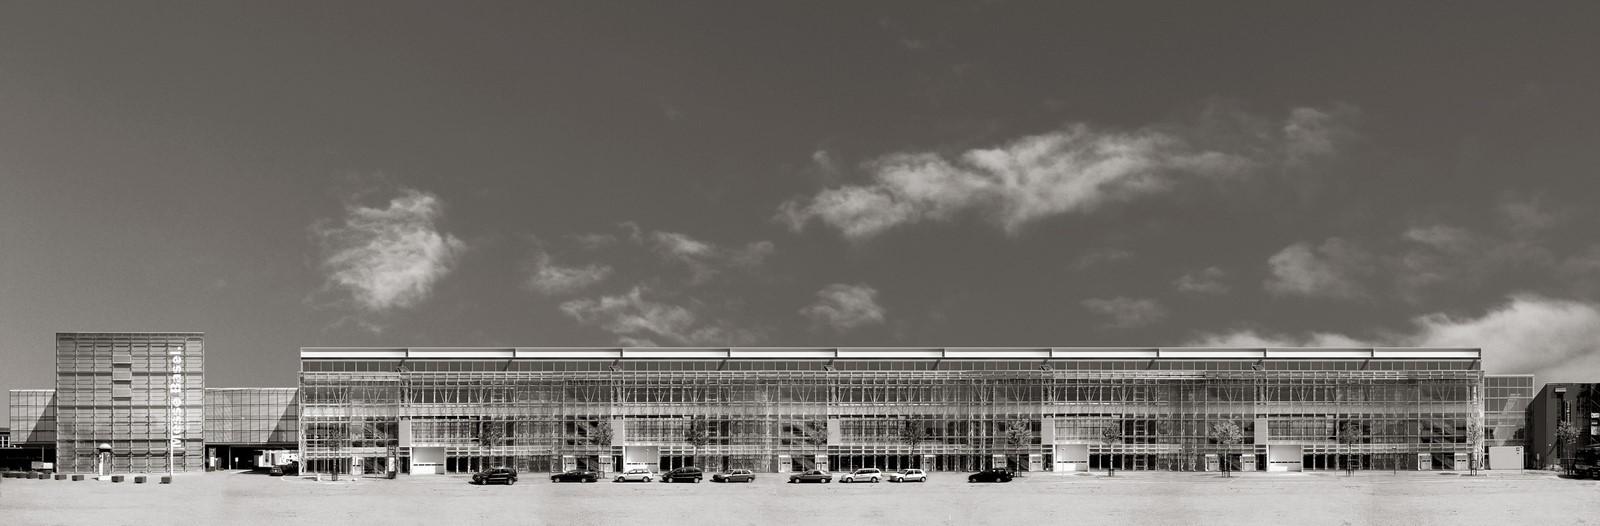 Basel Exhibition Centre, Hall- 1 - Sheet1